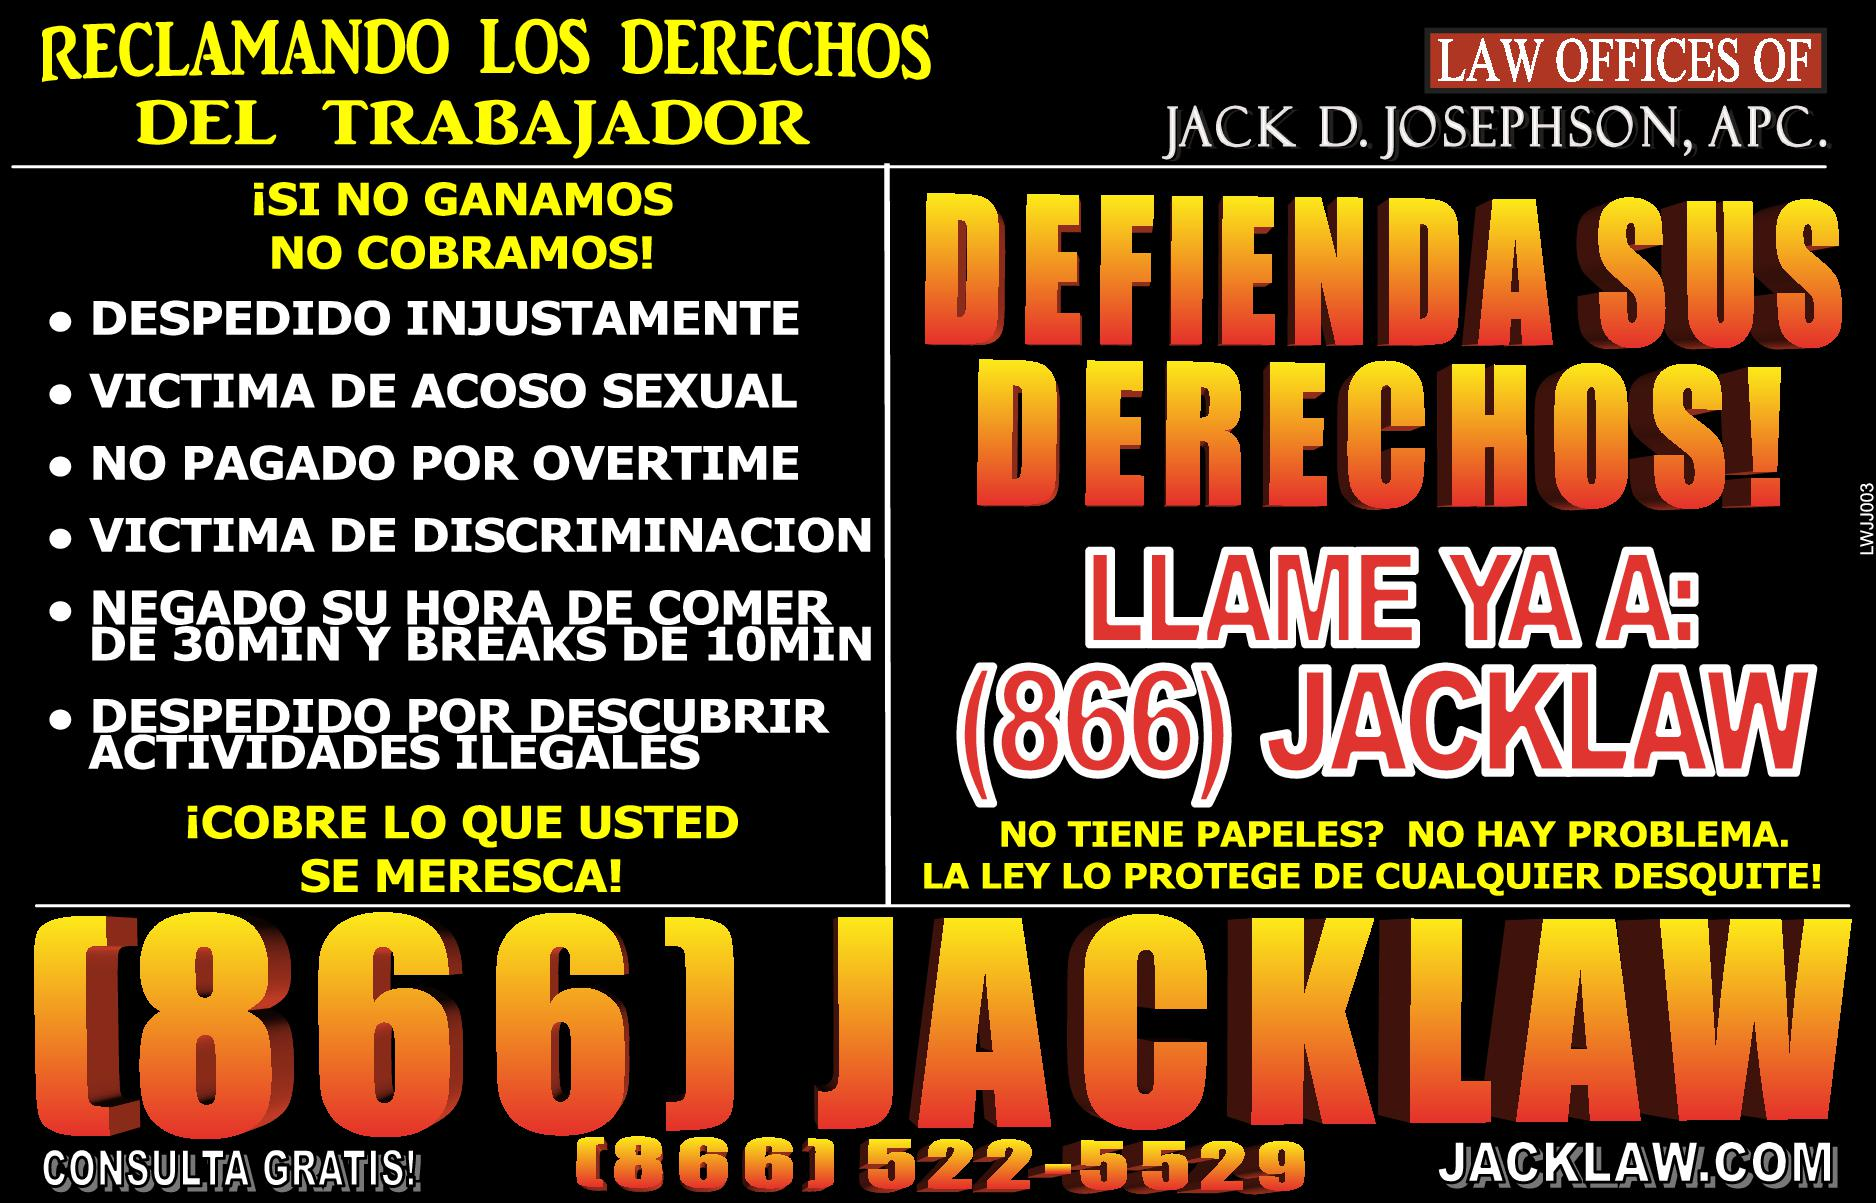 Law Office Of Jack D. Josephson